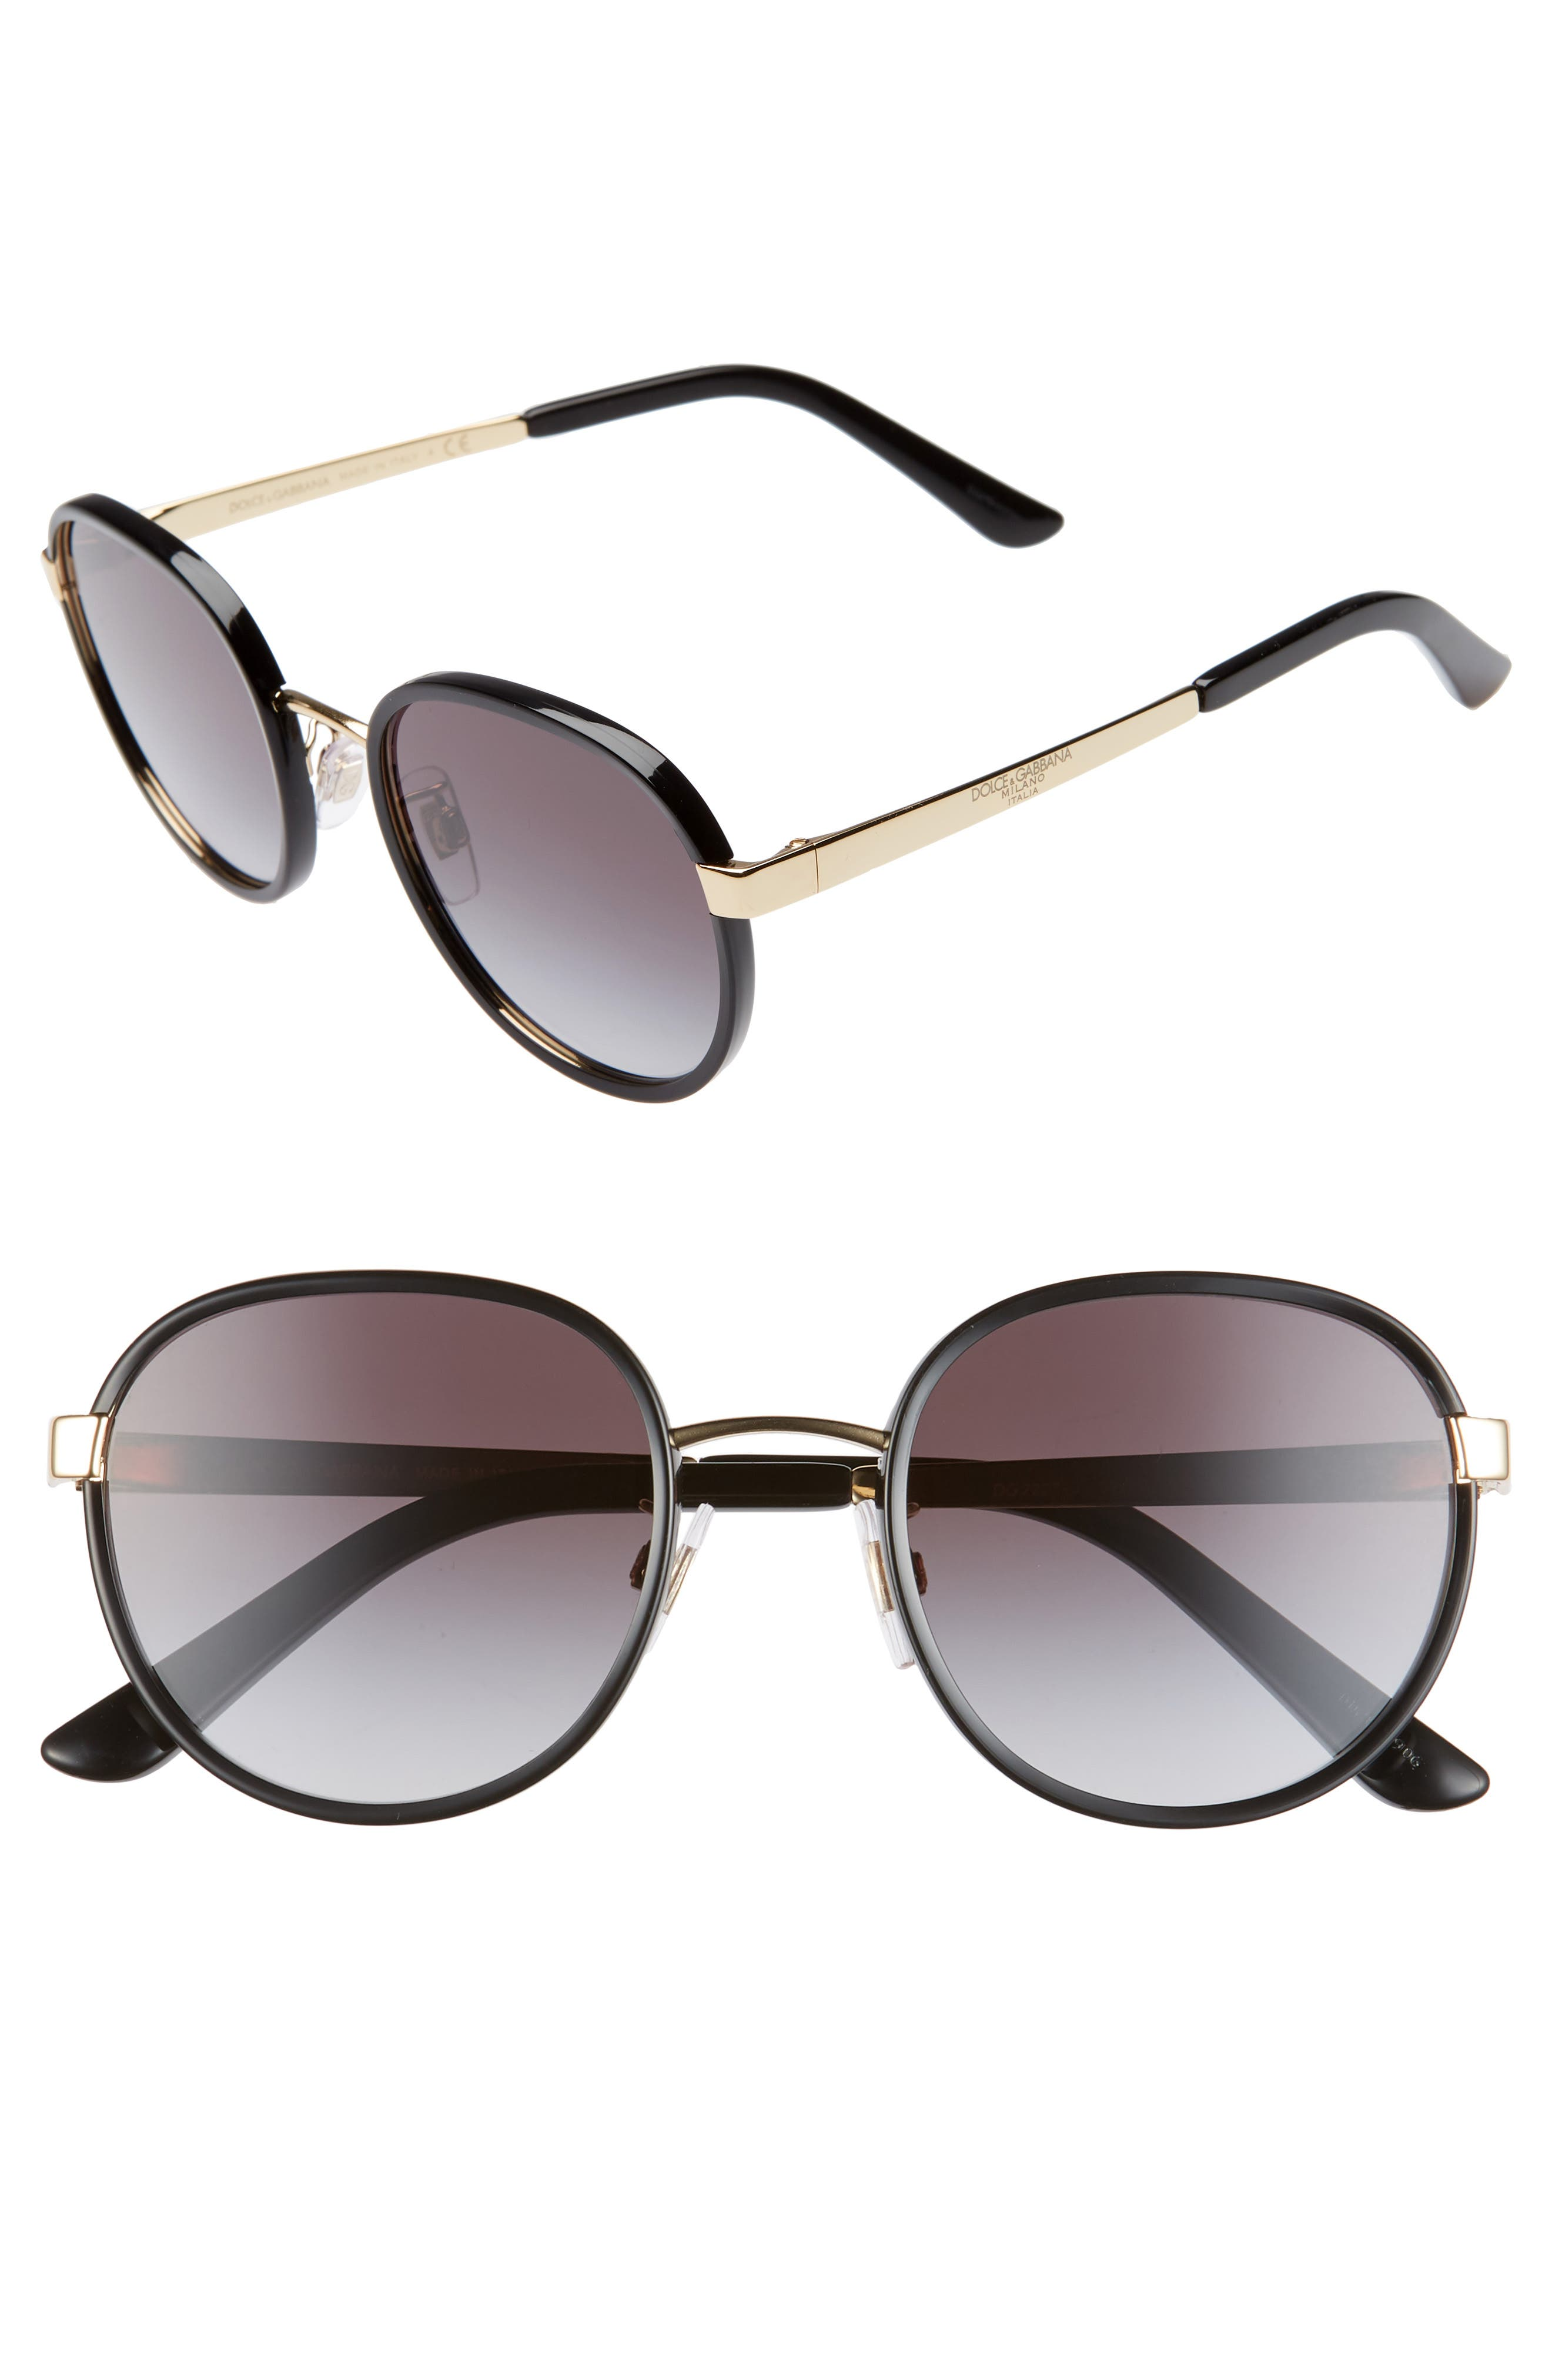 Dolce & gabbana 52Mm Round Sunglasses - Black/ Gold